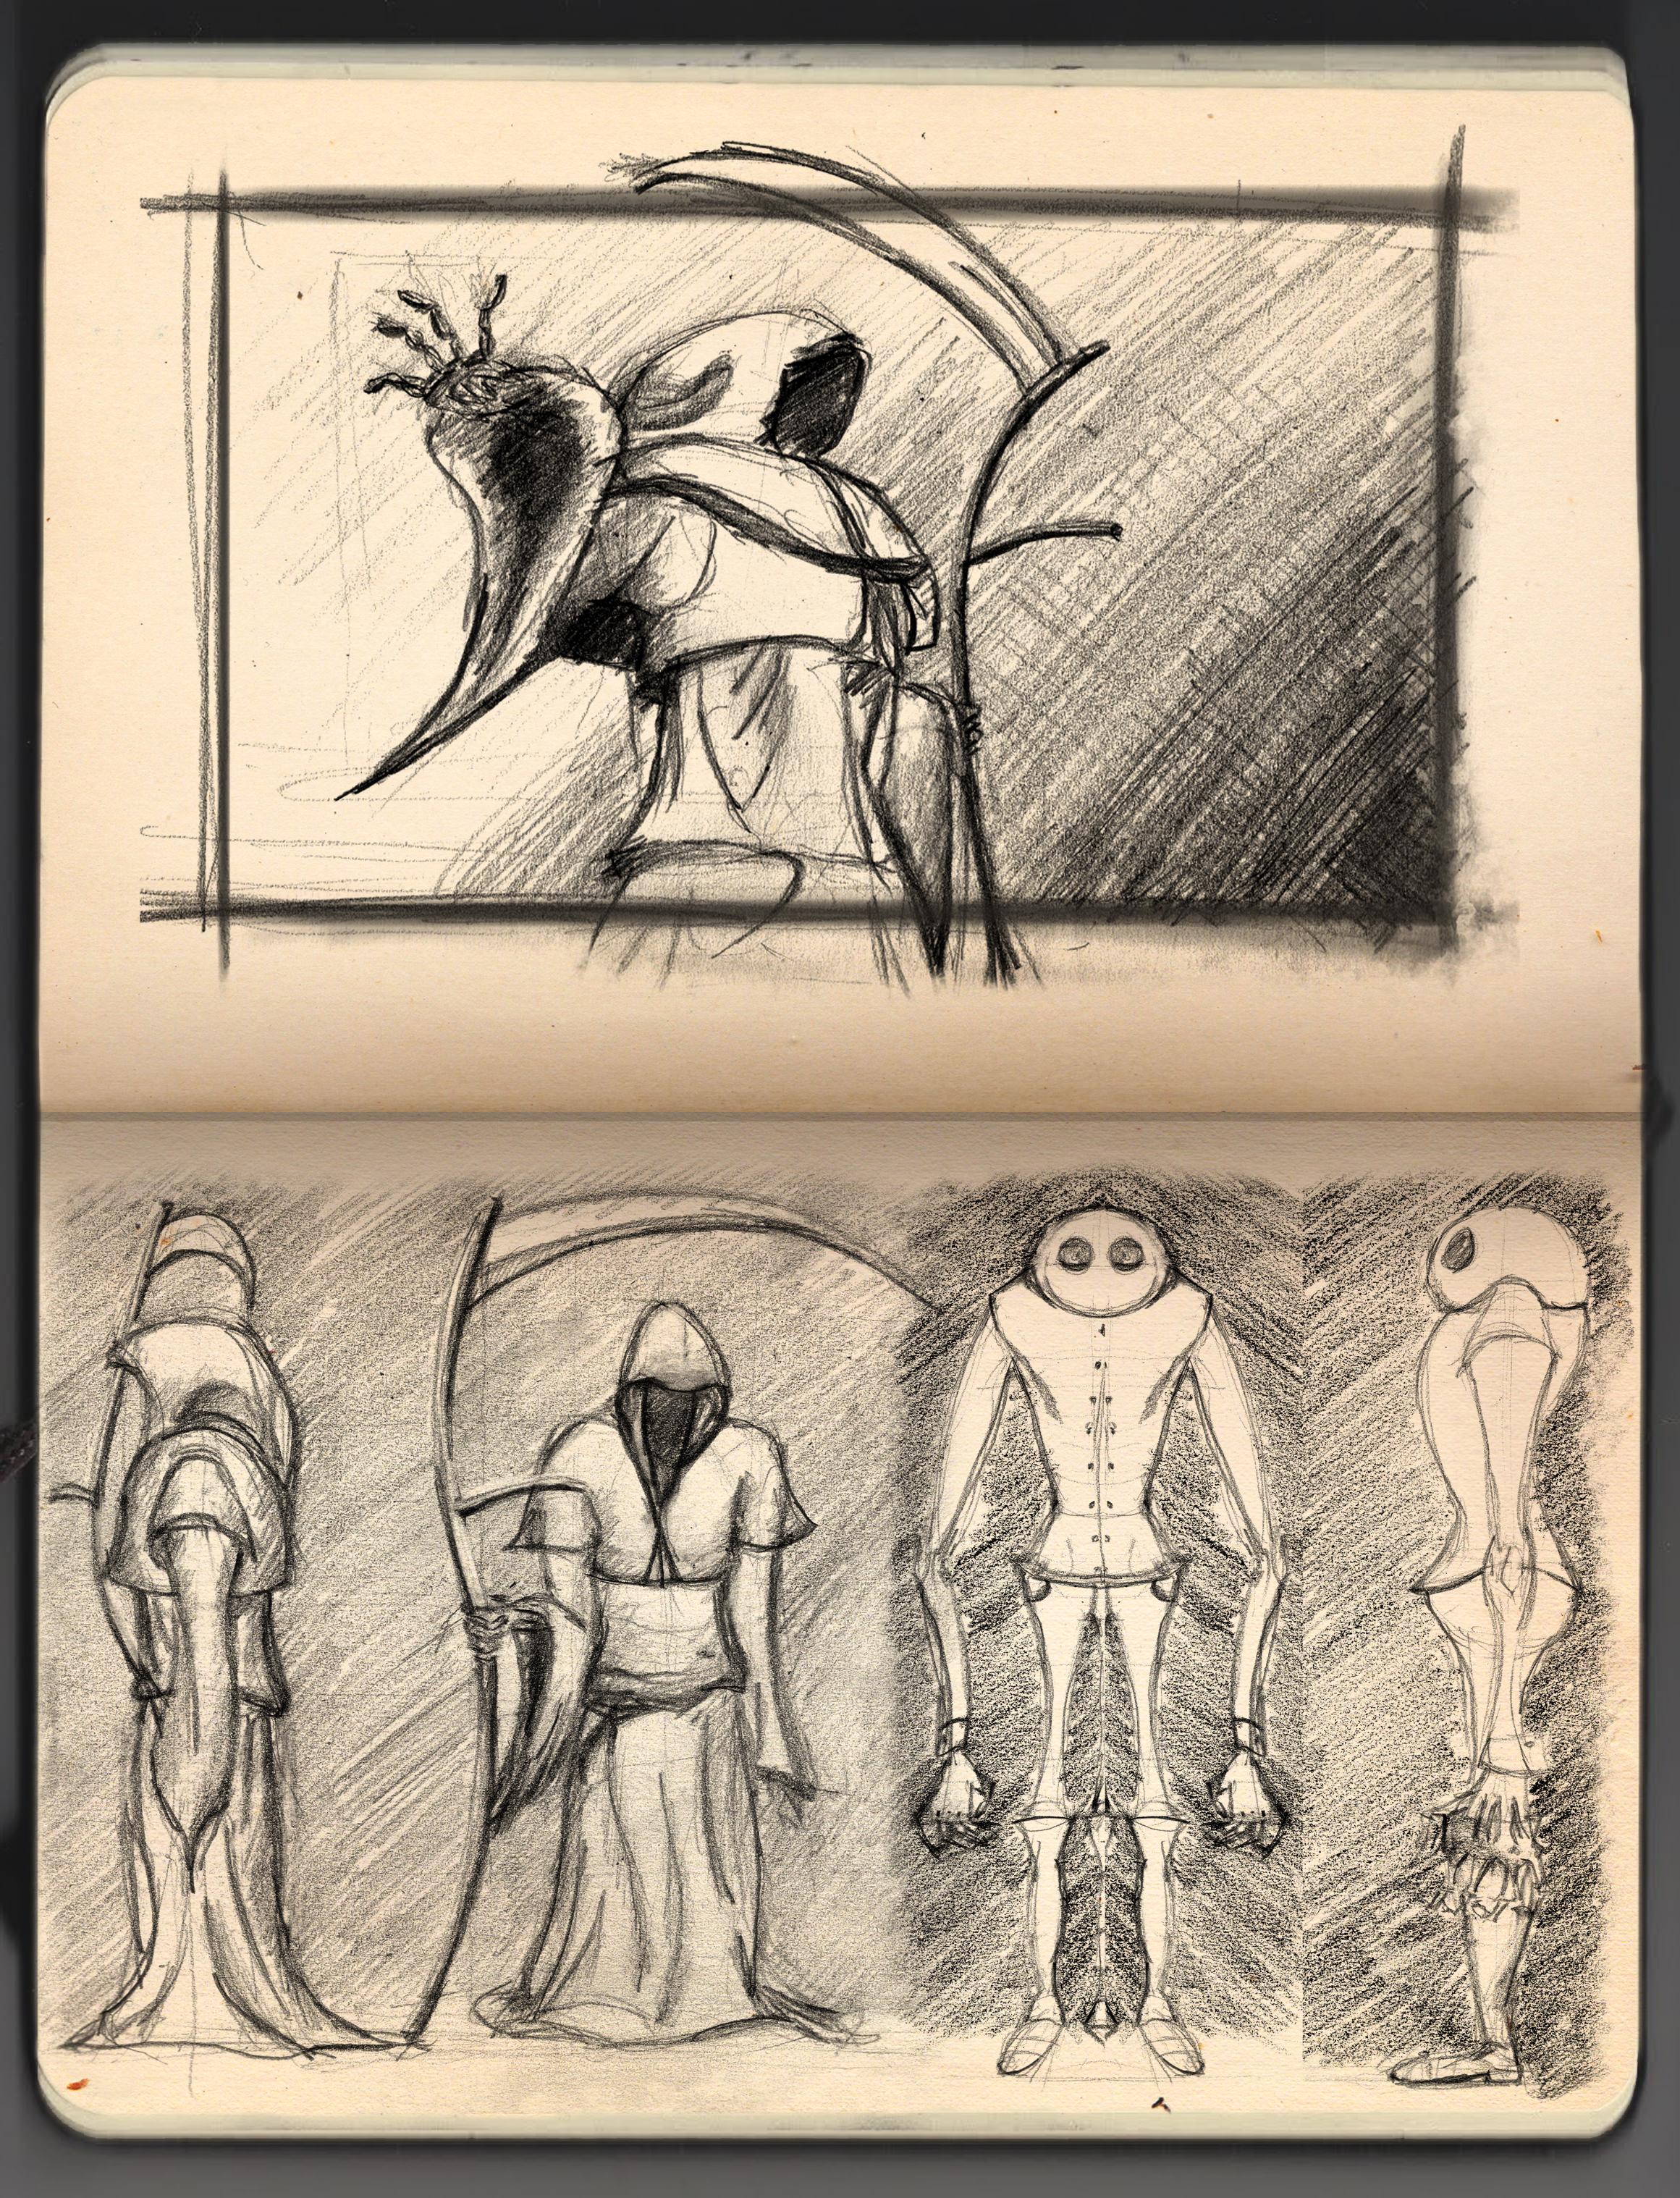 moleskine-book022.jpg